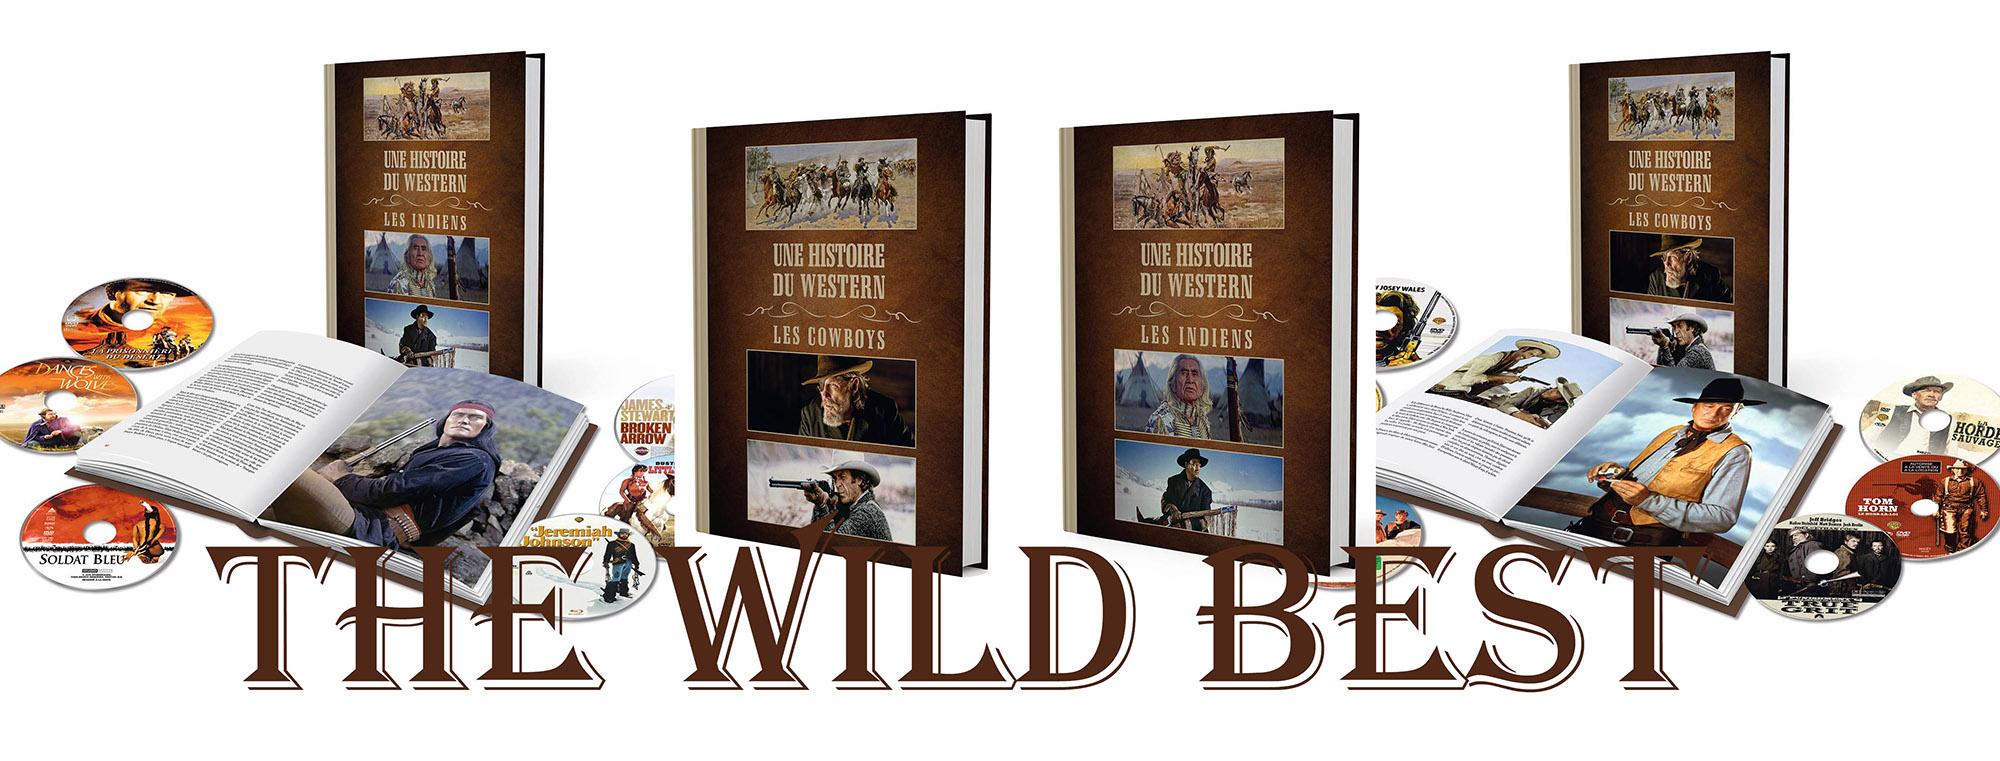 histoire du western